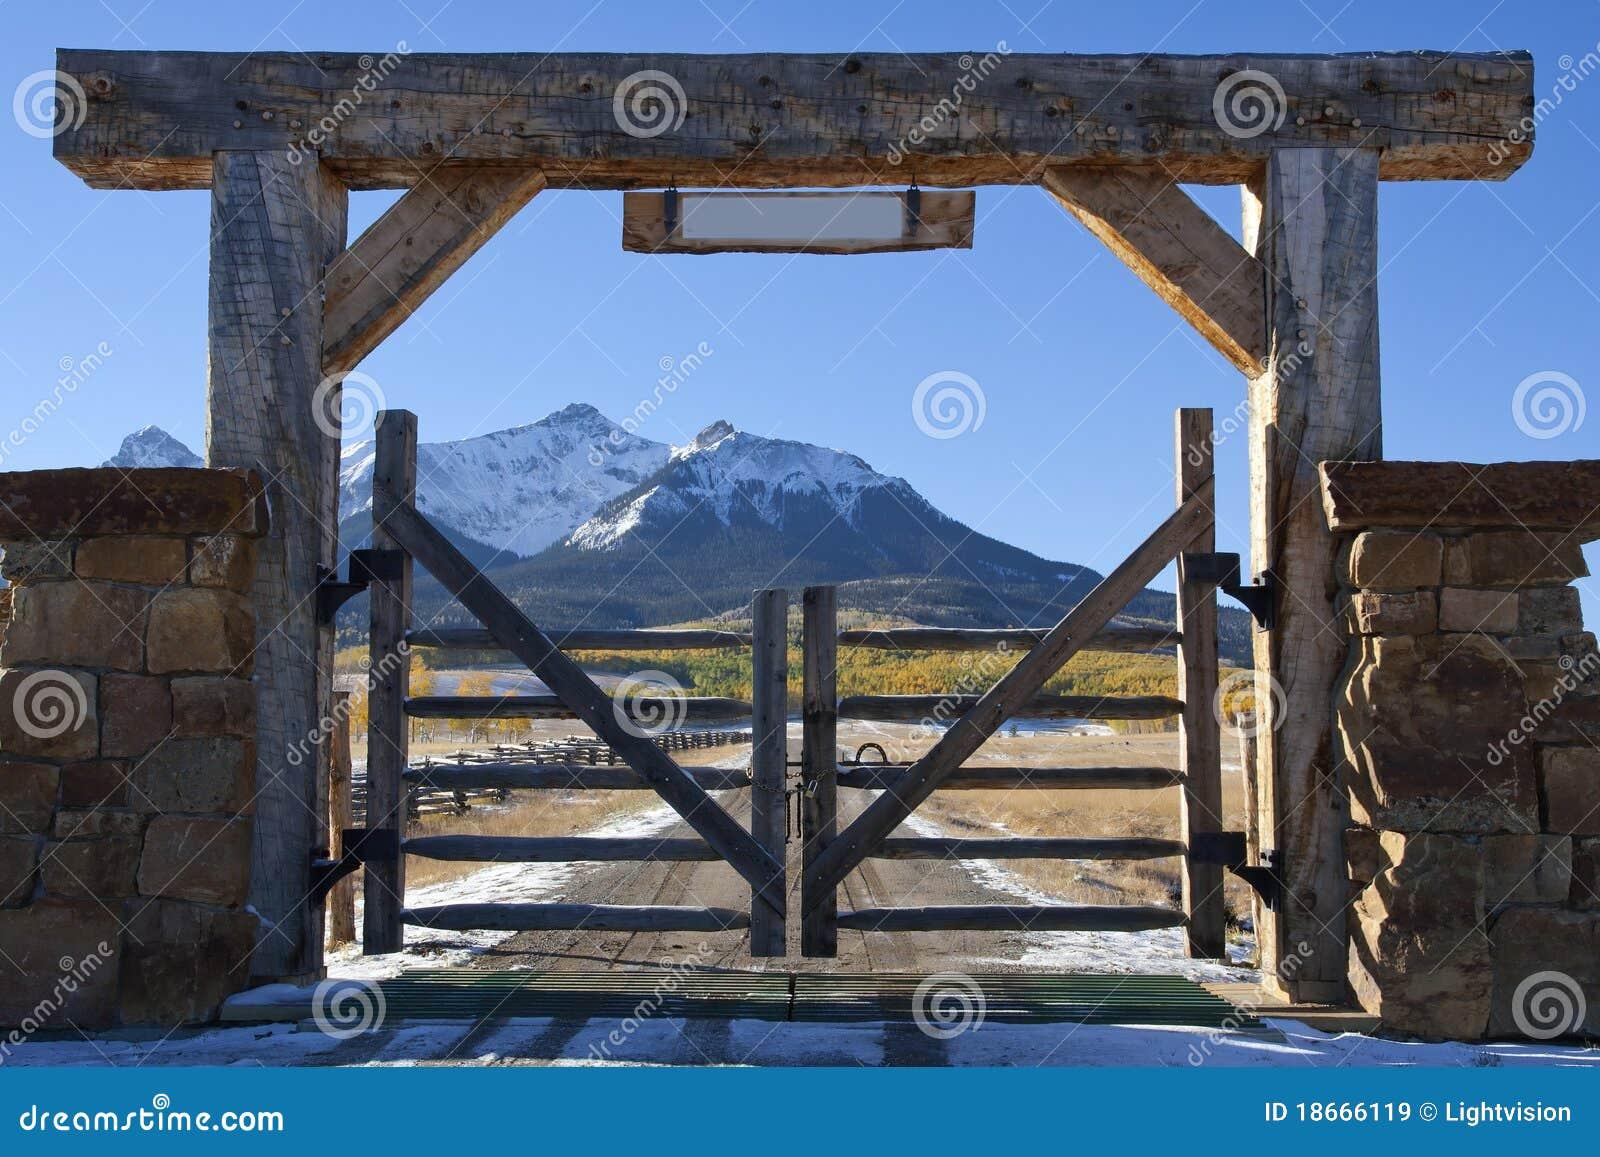 Kolorado-Ranch mit hölzernem Gatter